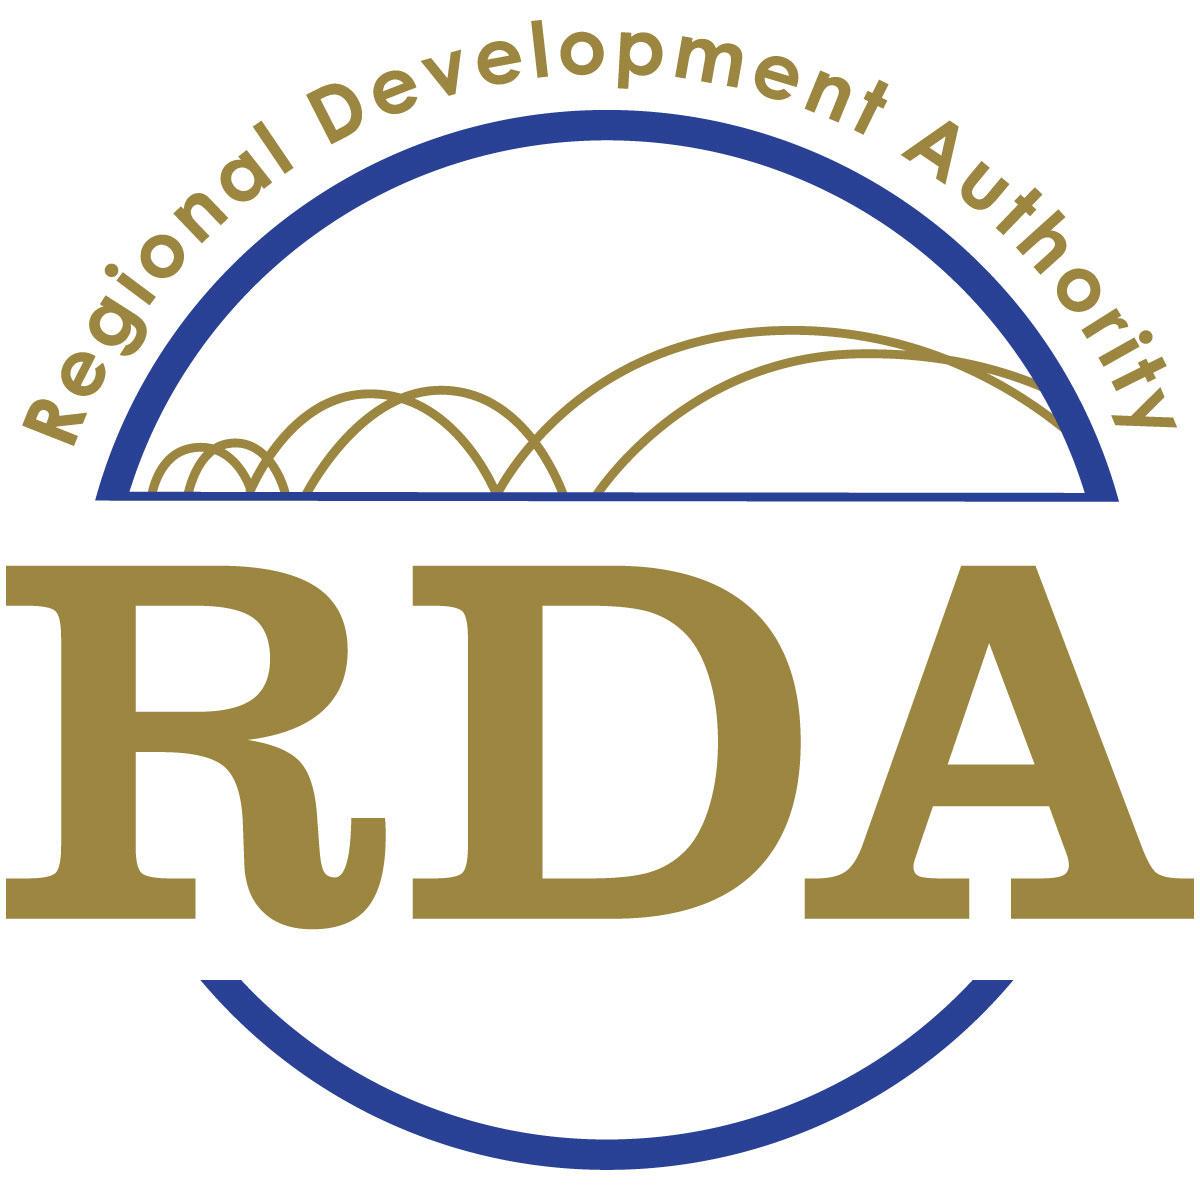 Regional Development Authority